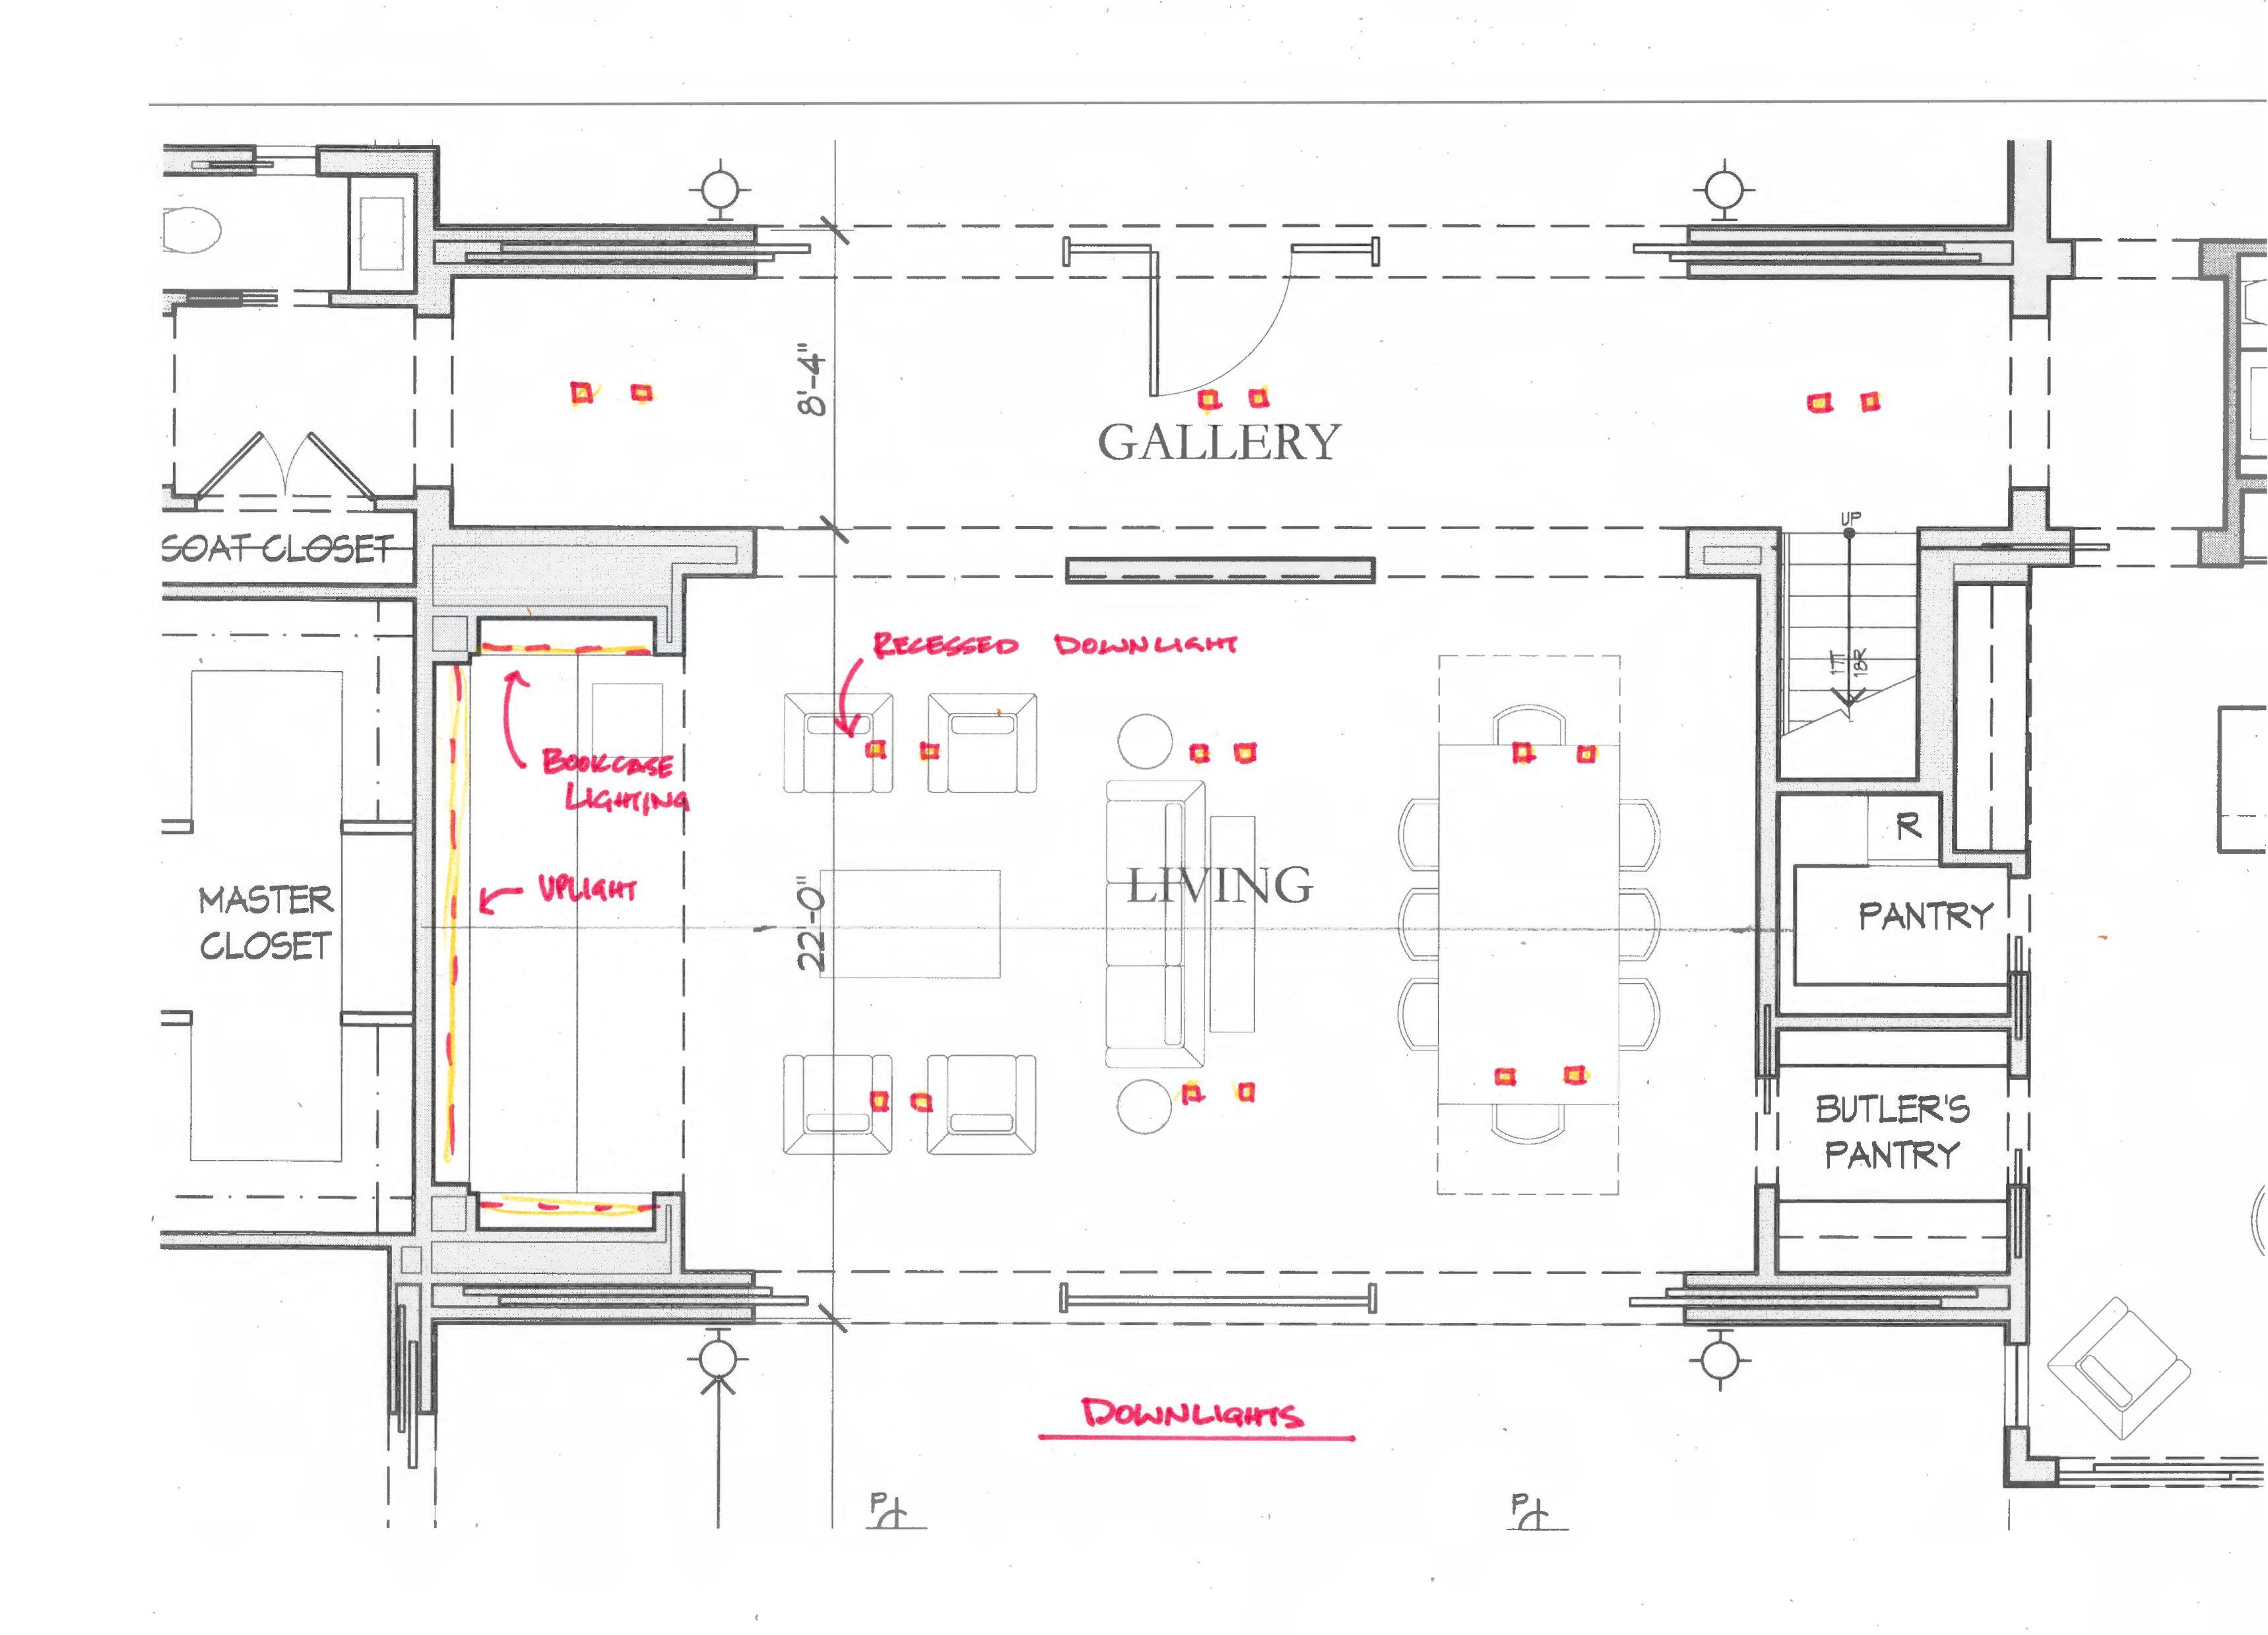 Downlight Layout Layout Floor Plans Downlights